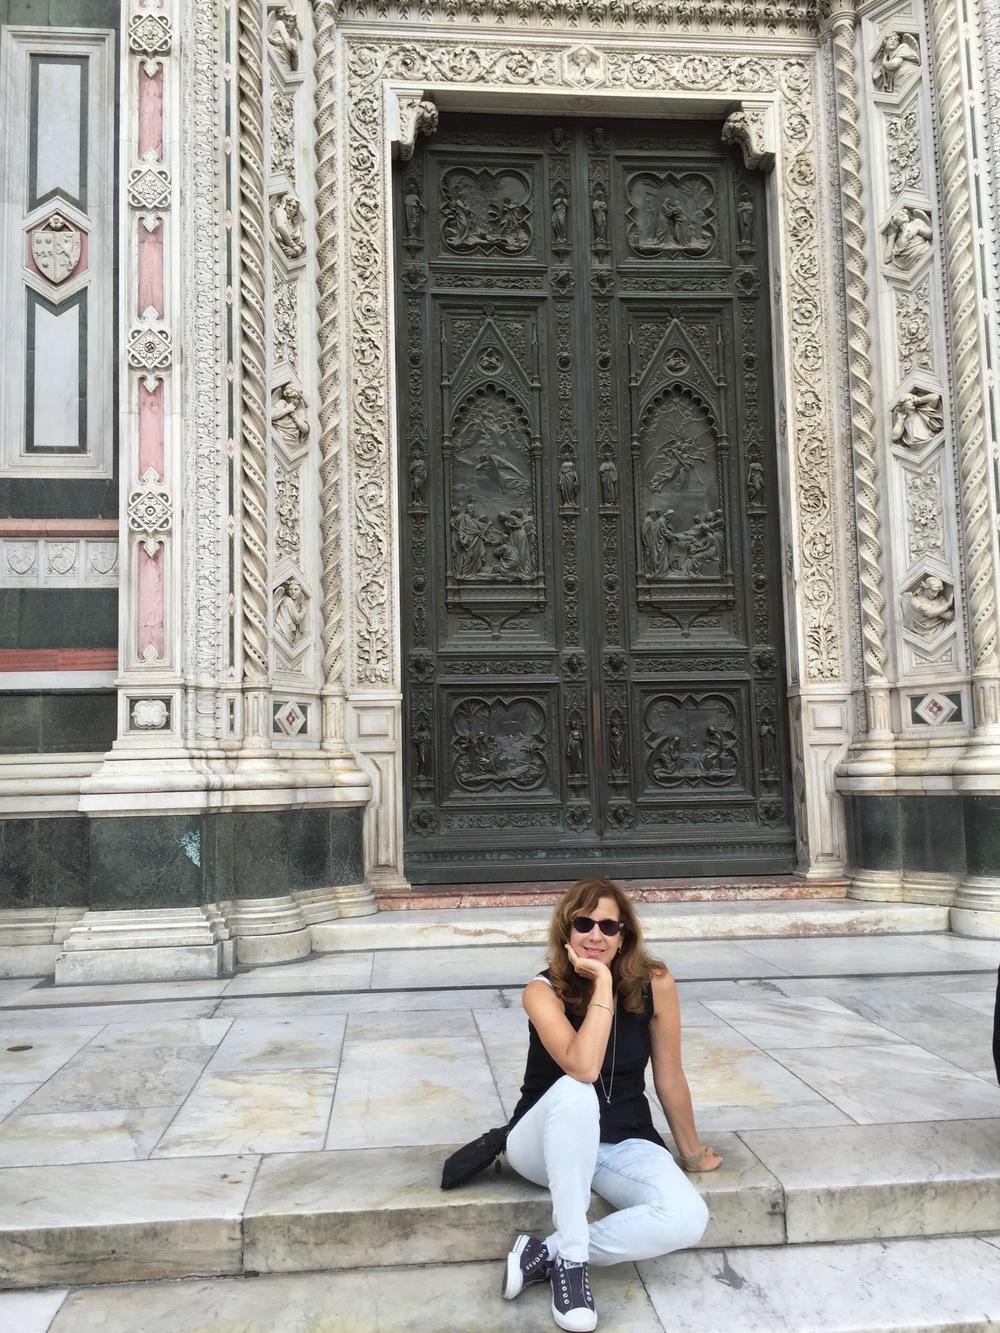 .....like Florence, Italy